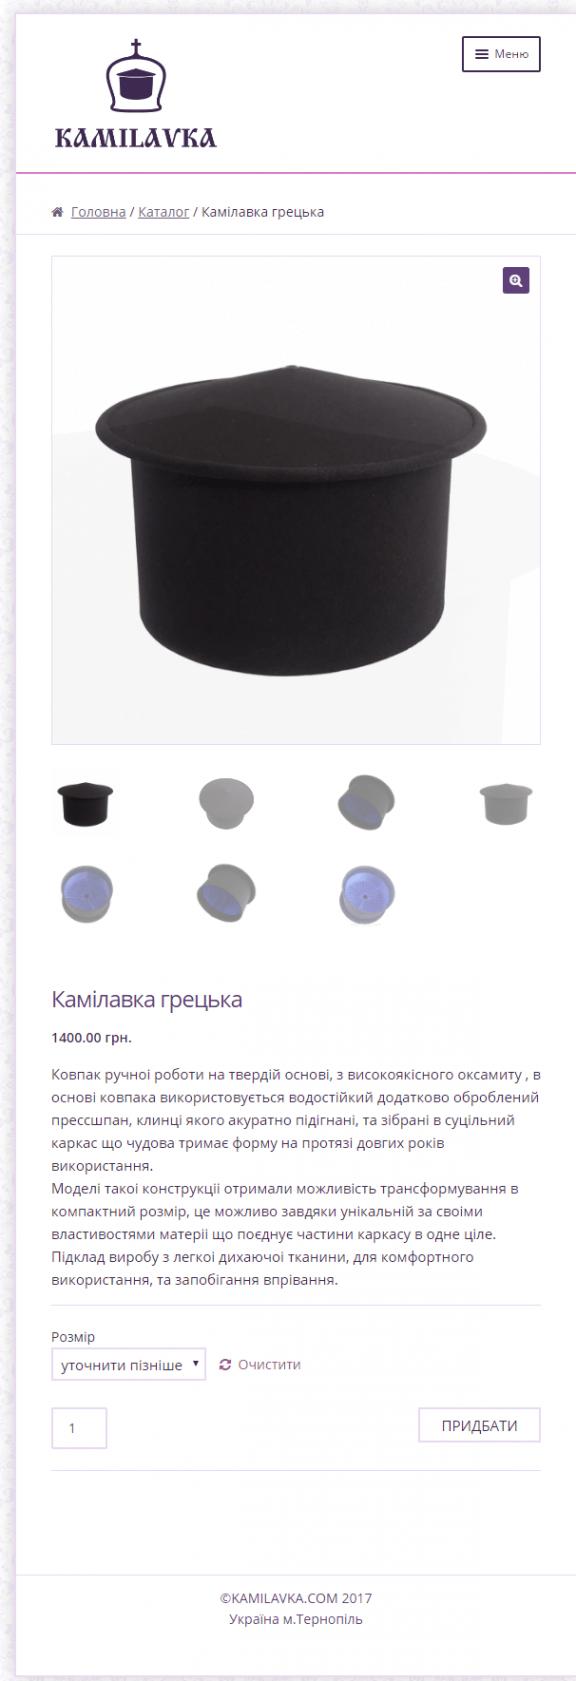 kamilavka-com-03